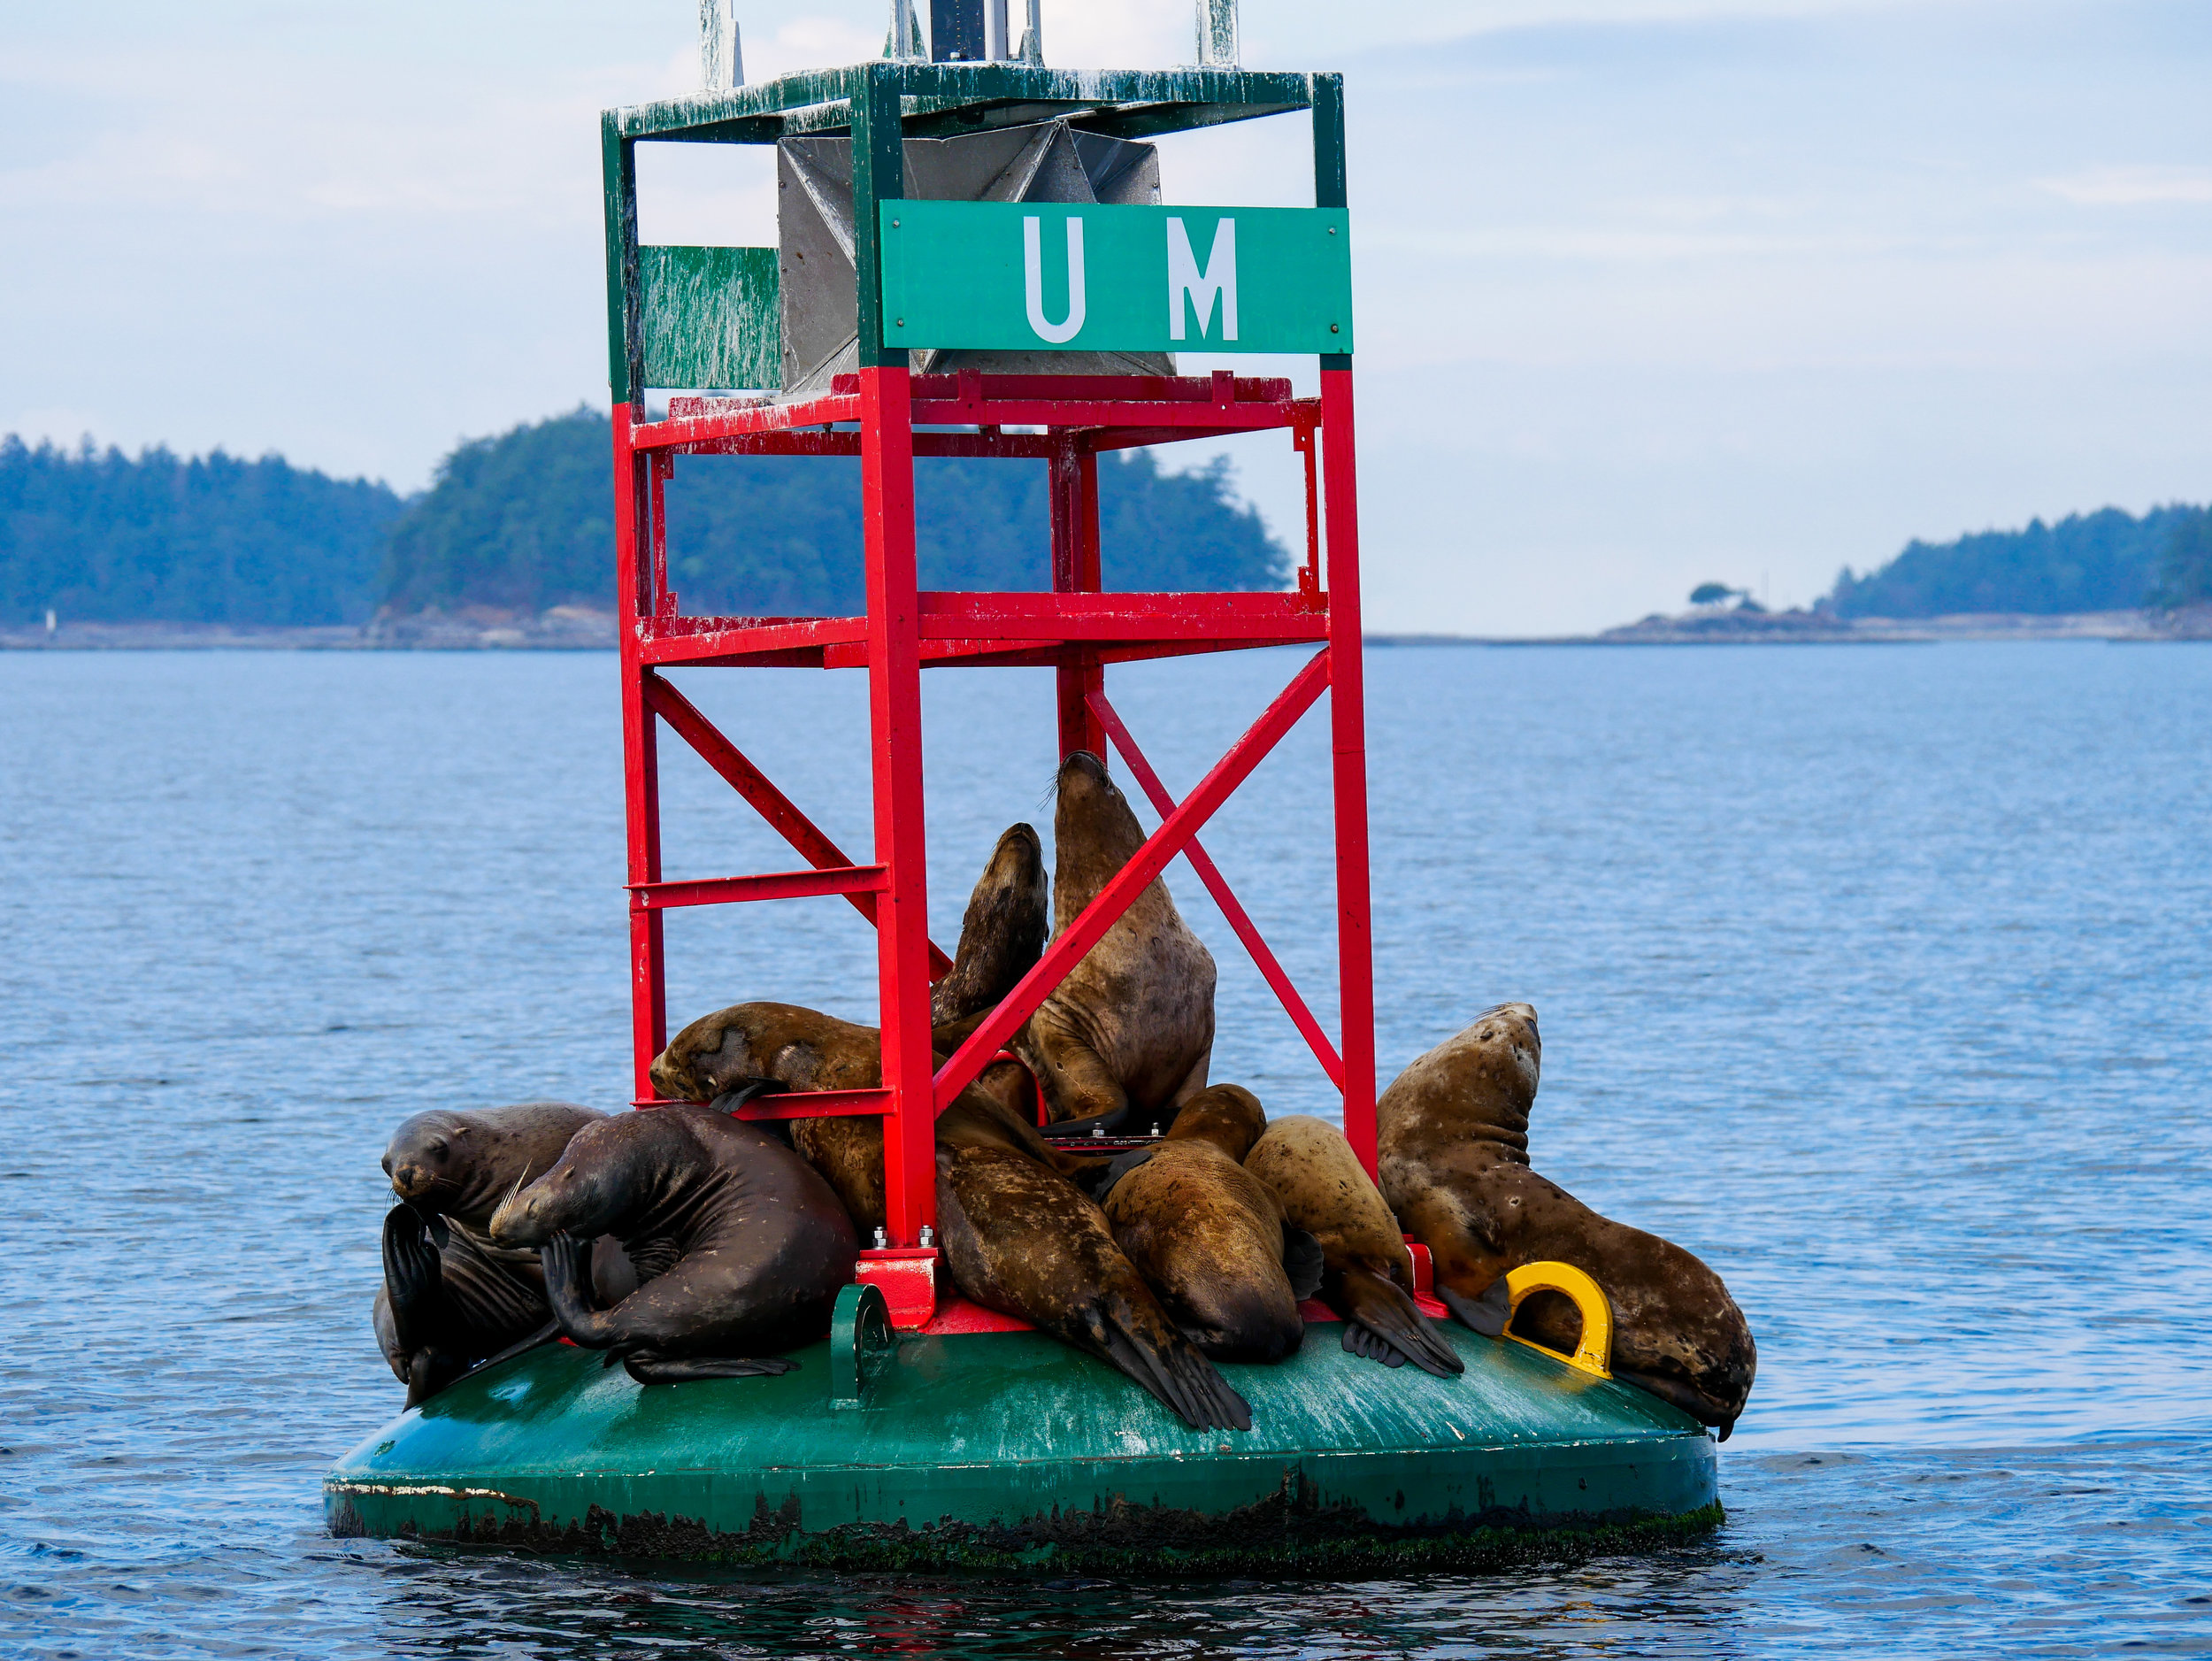 Steller sea lions hanging around at Gabriola Reef. Photo by Alanna Vivani - 10:30 tour.